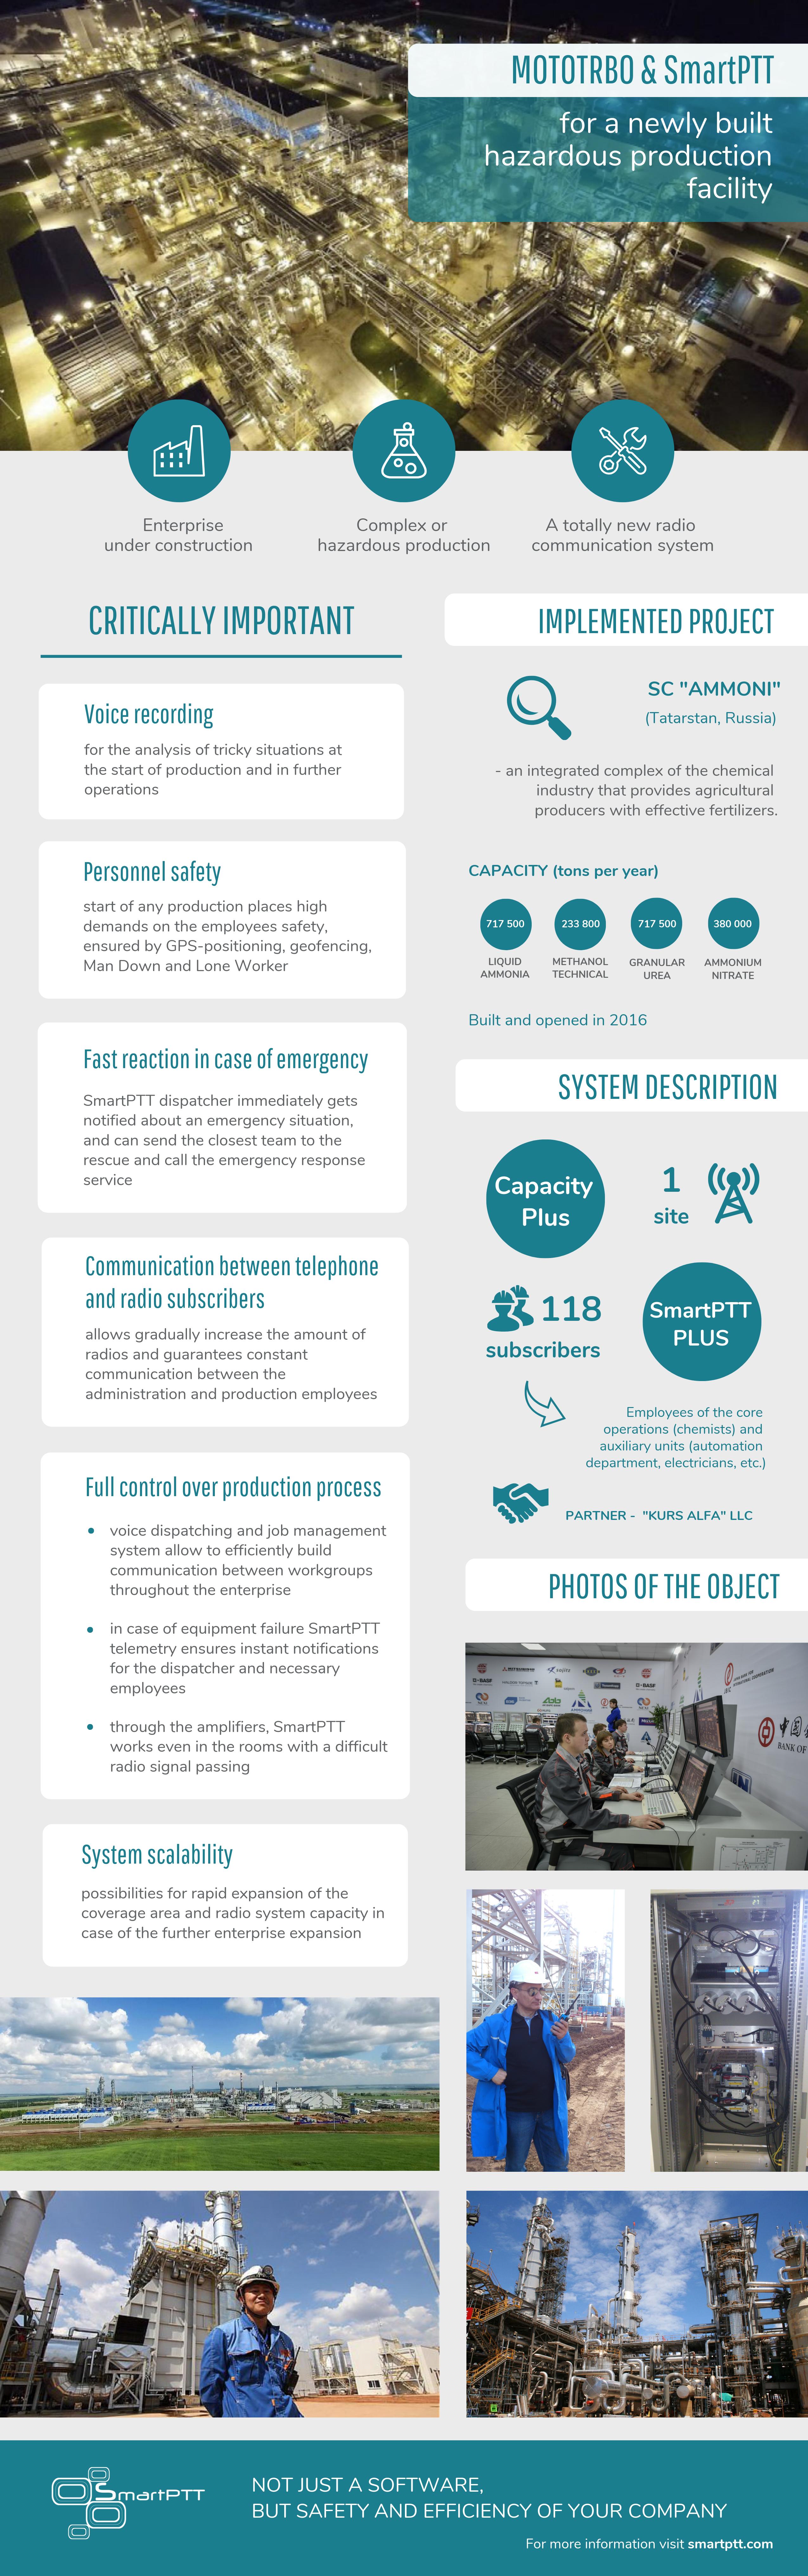 SmartPTT Case Study Manufacturing Ammoni